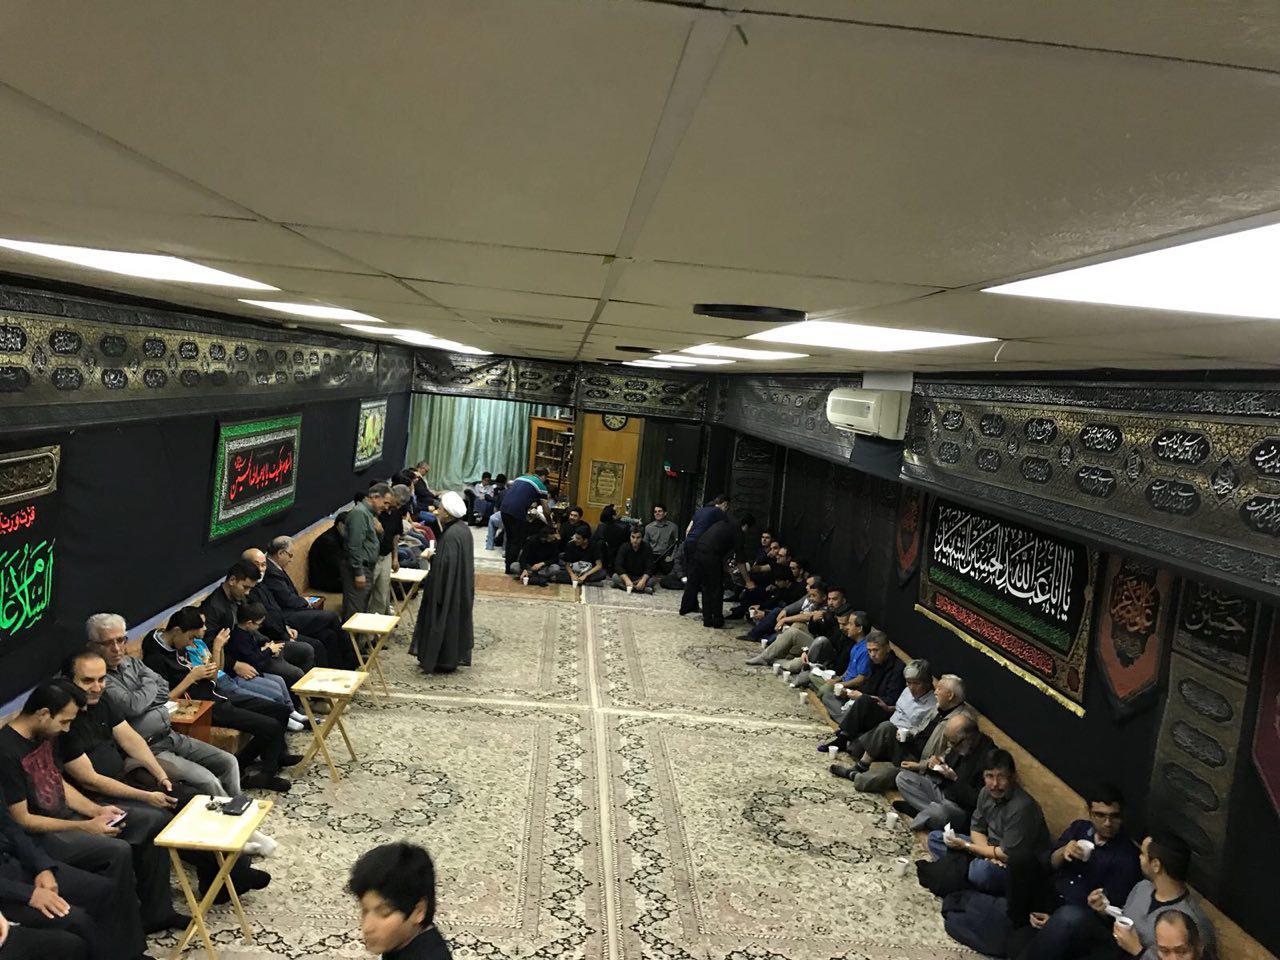 تصویر مراسم سوگواری شهادت حضرت «سيدالشهدا عليه السلام» – شب تاسوعای حسینی ۱۴۳۹